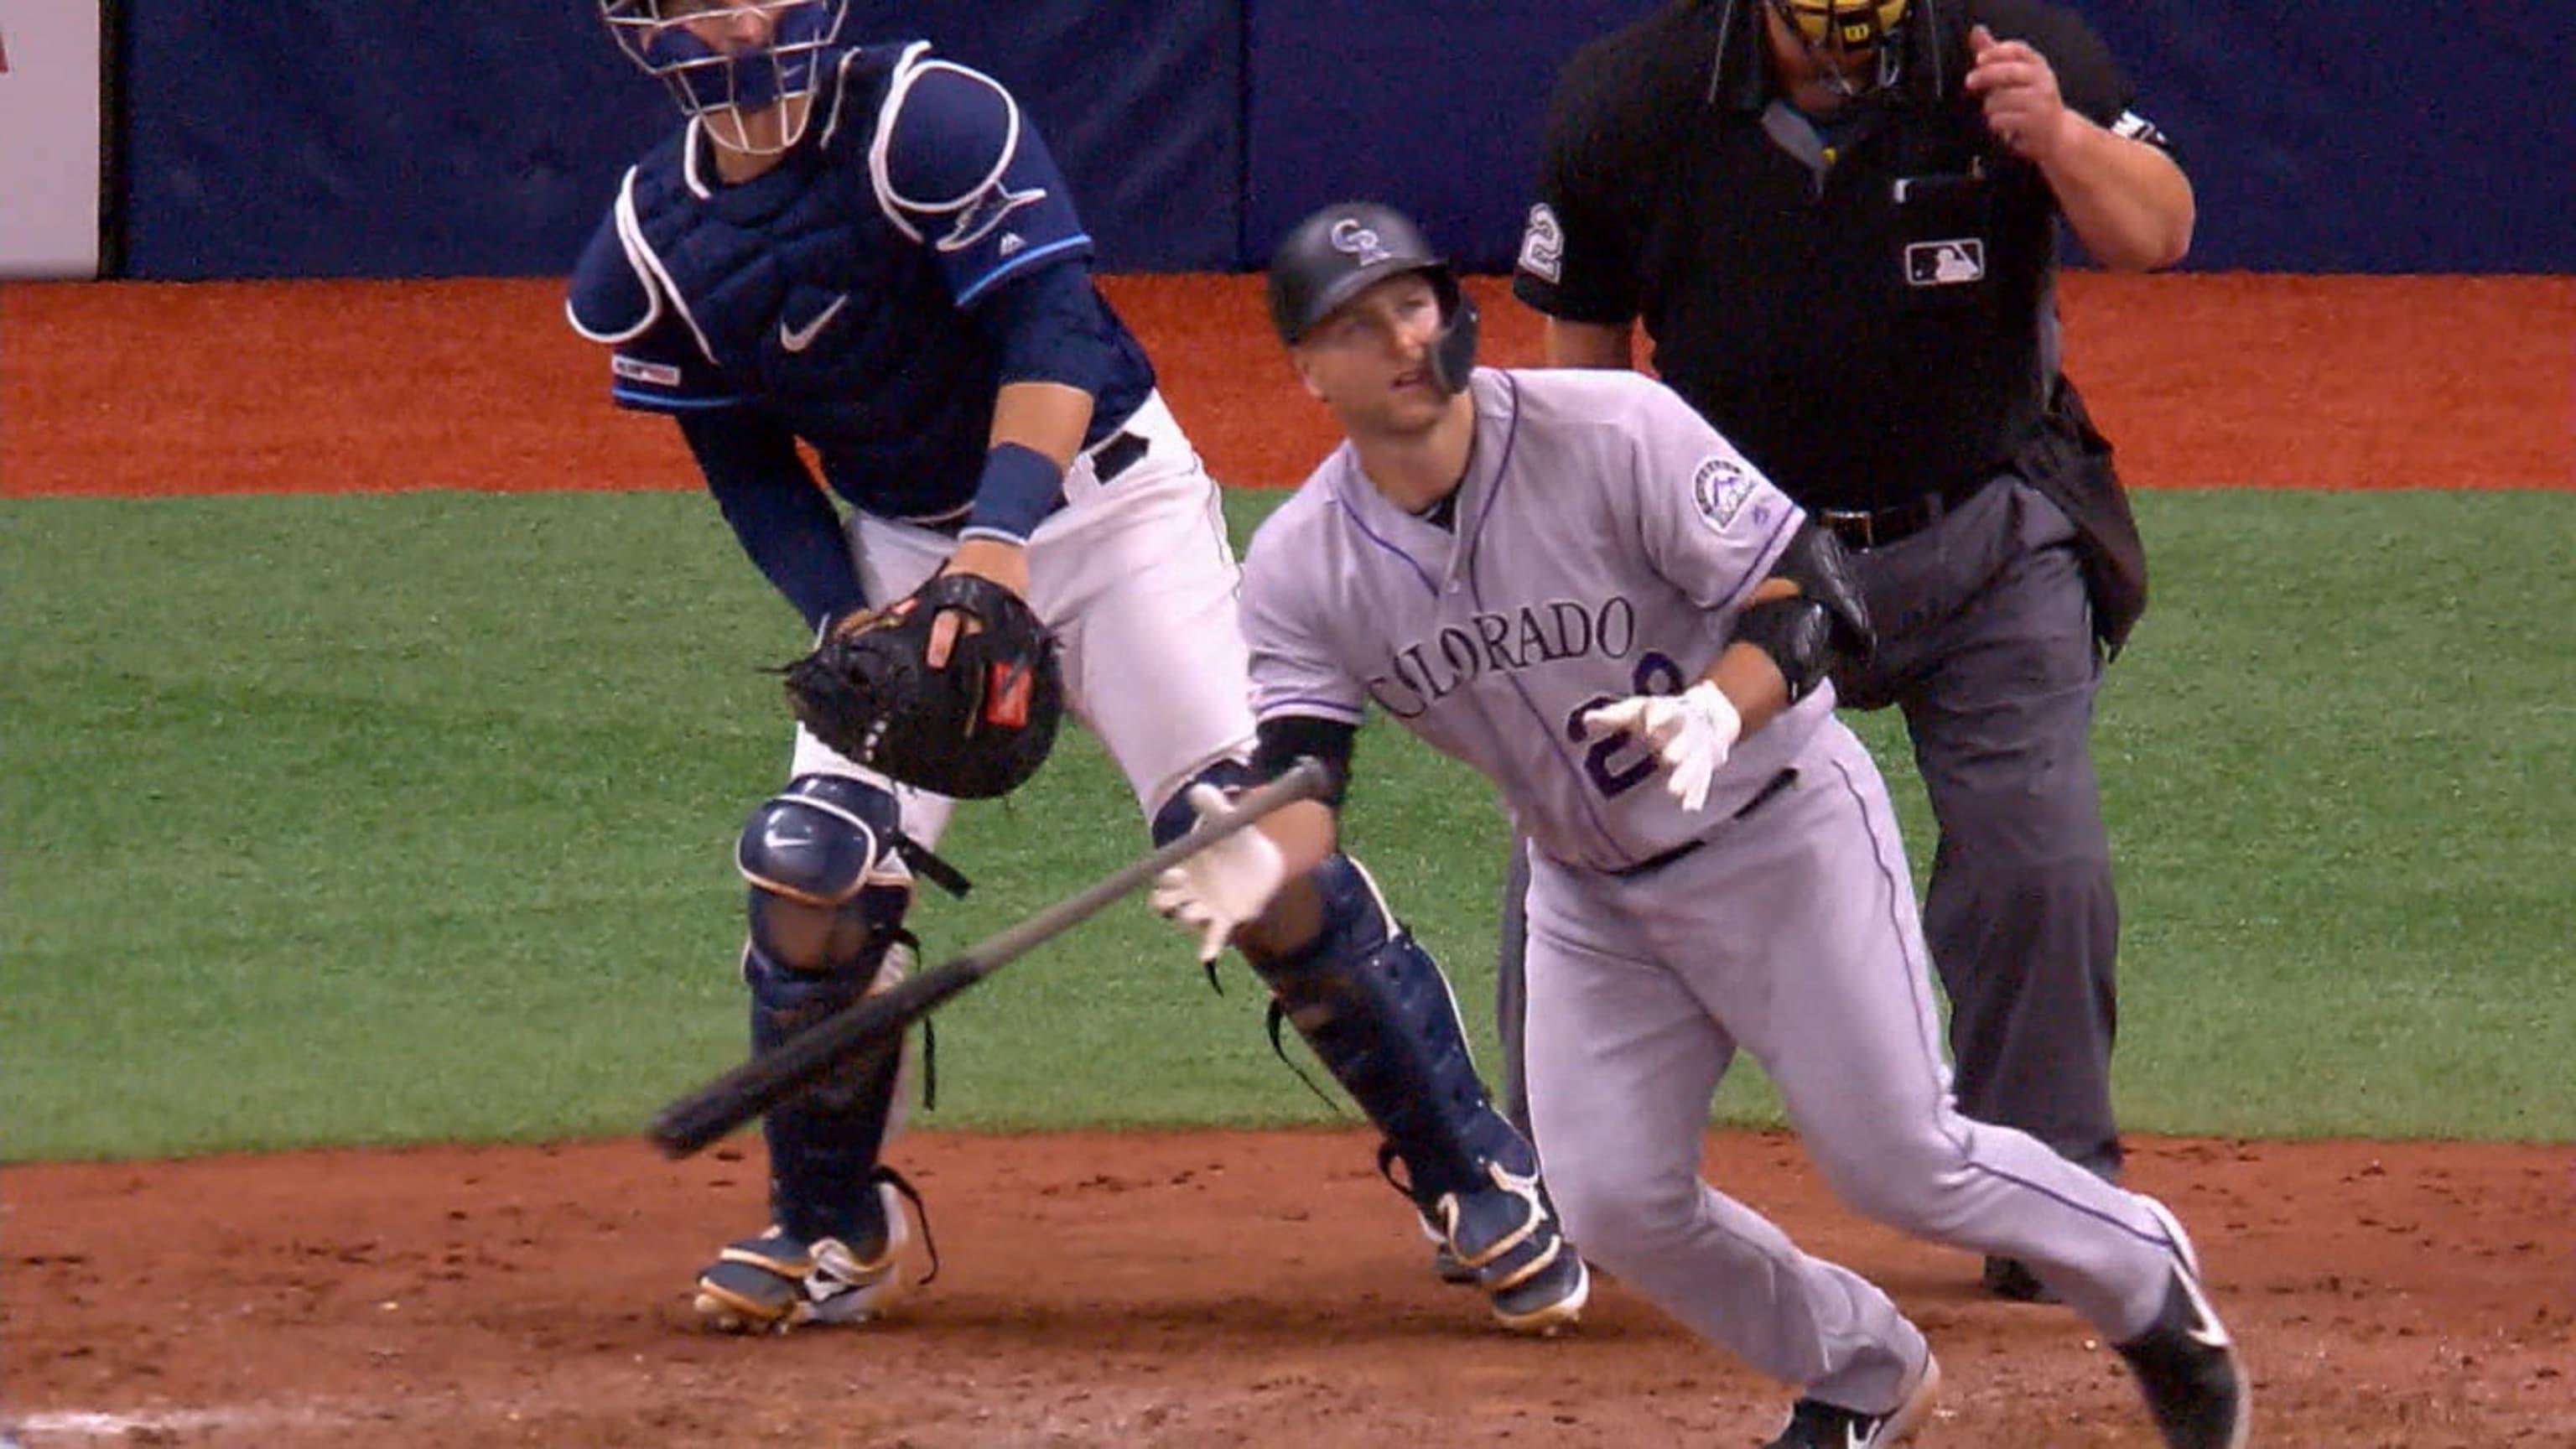 Yankees sign veteran catcher Chris Iannetta